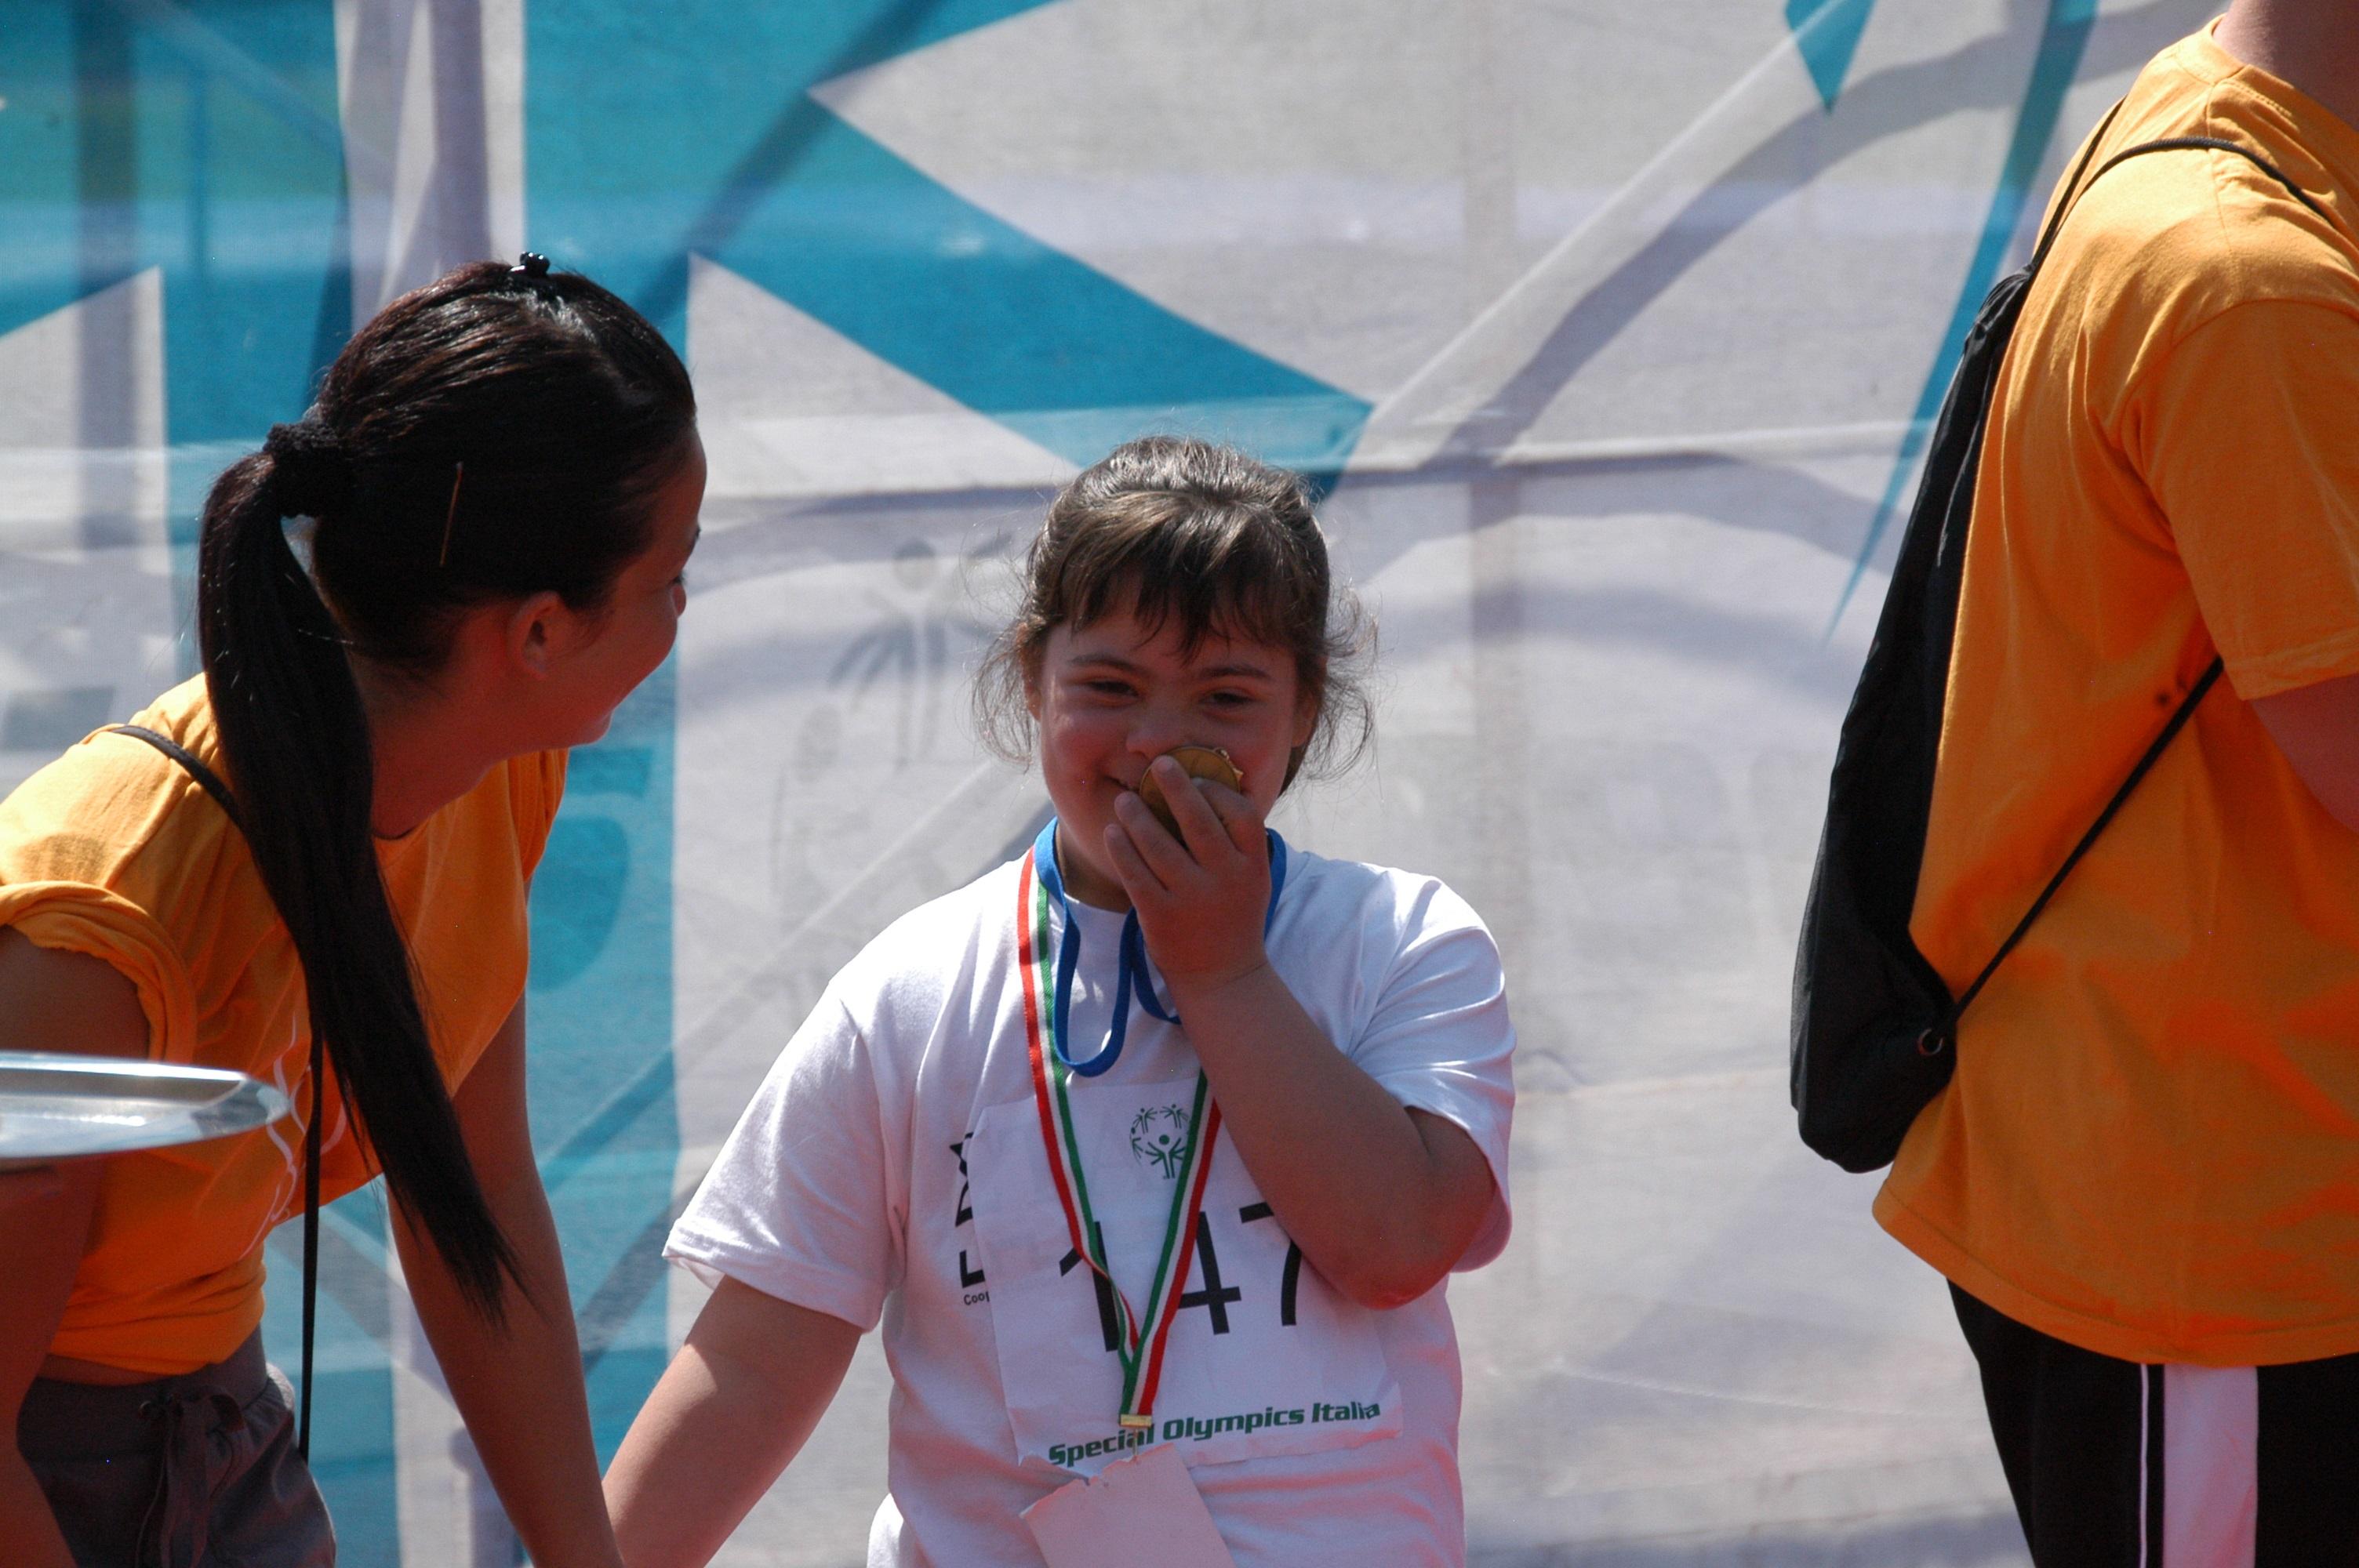 Special_Olympics_Alumni_LUISSBusiness_2